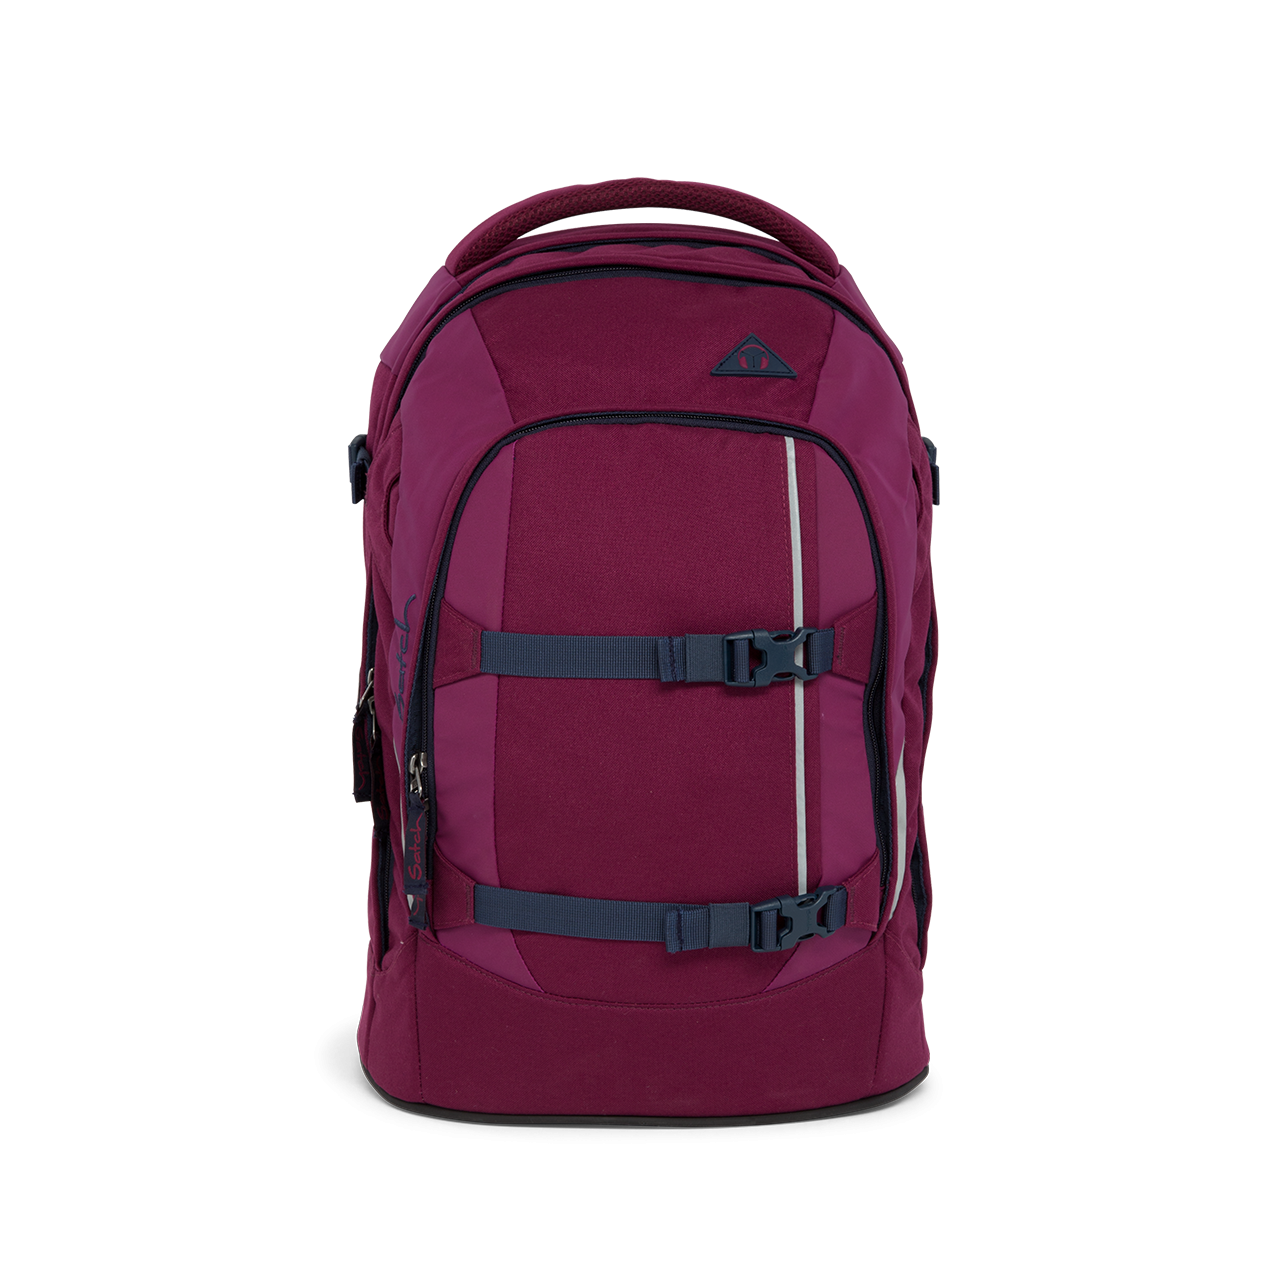 satch pack pure purple durch und durch lila satch. Black Bedroom Furniture Sets. Home Design Ideas